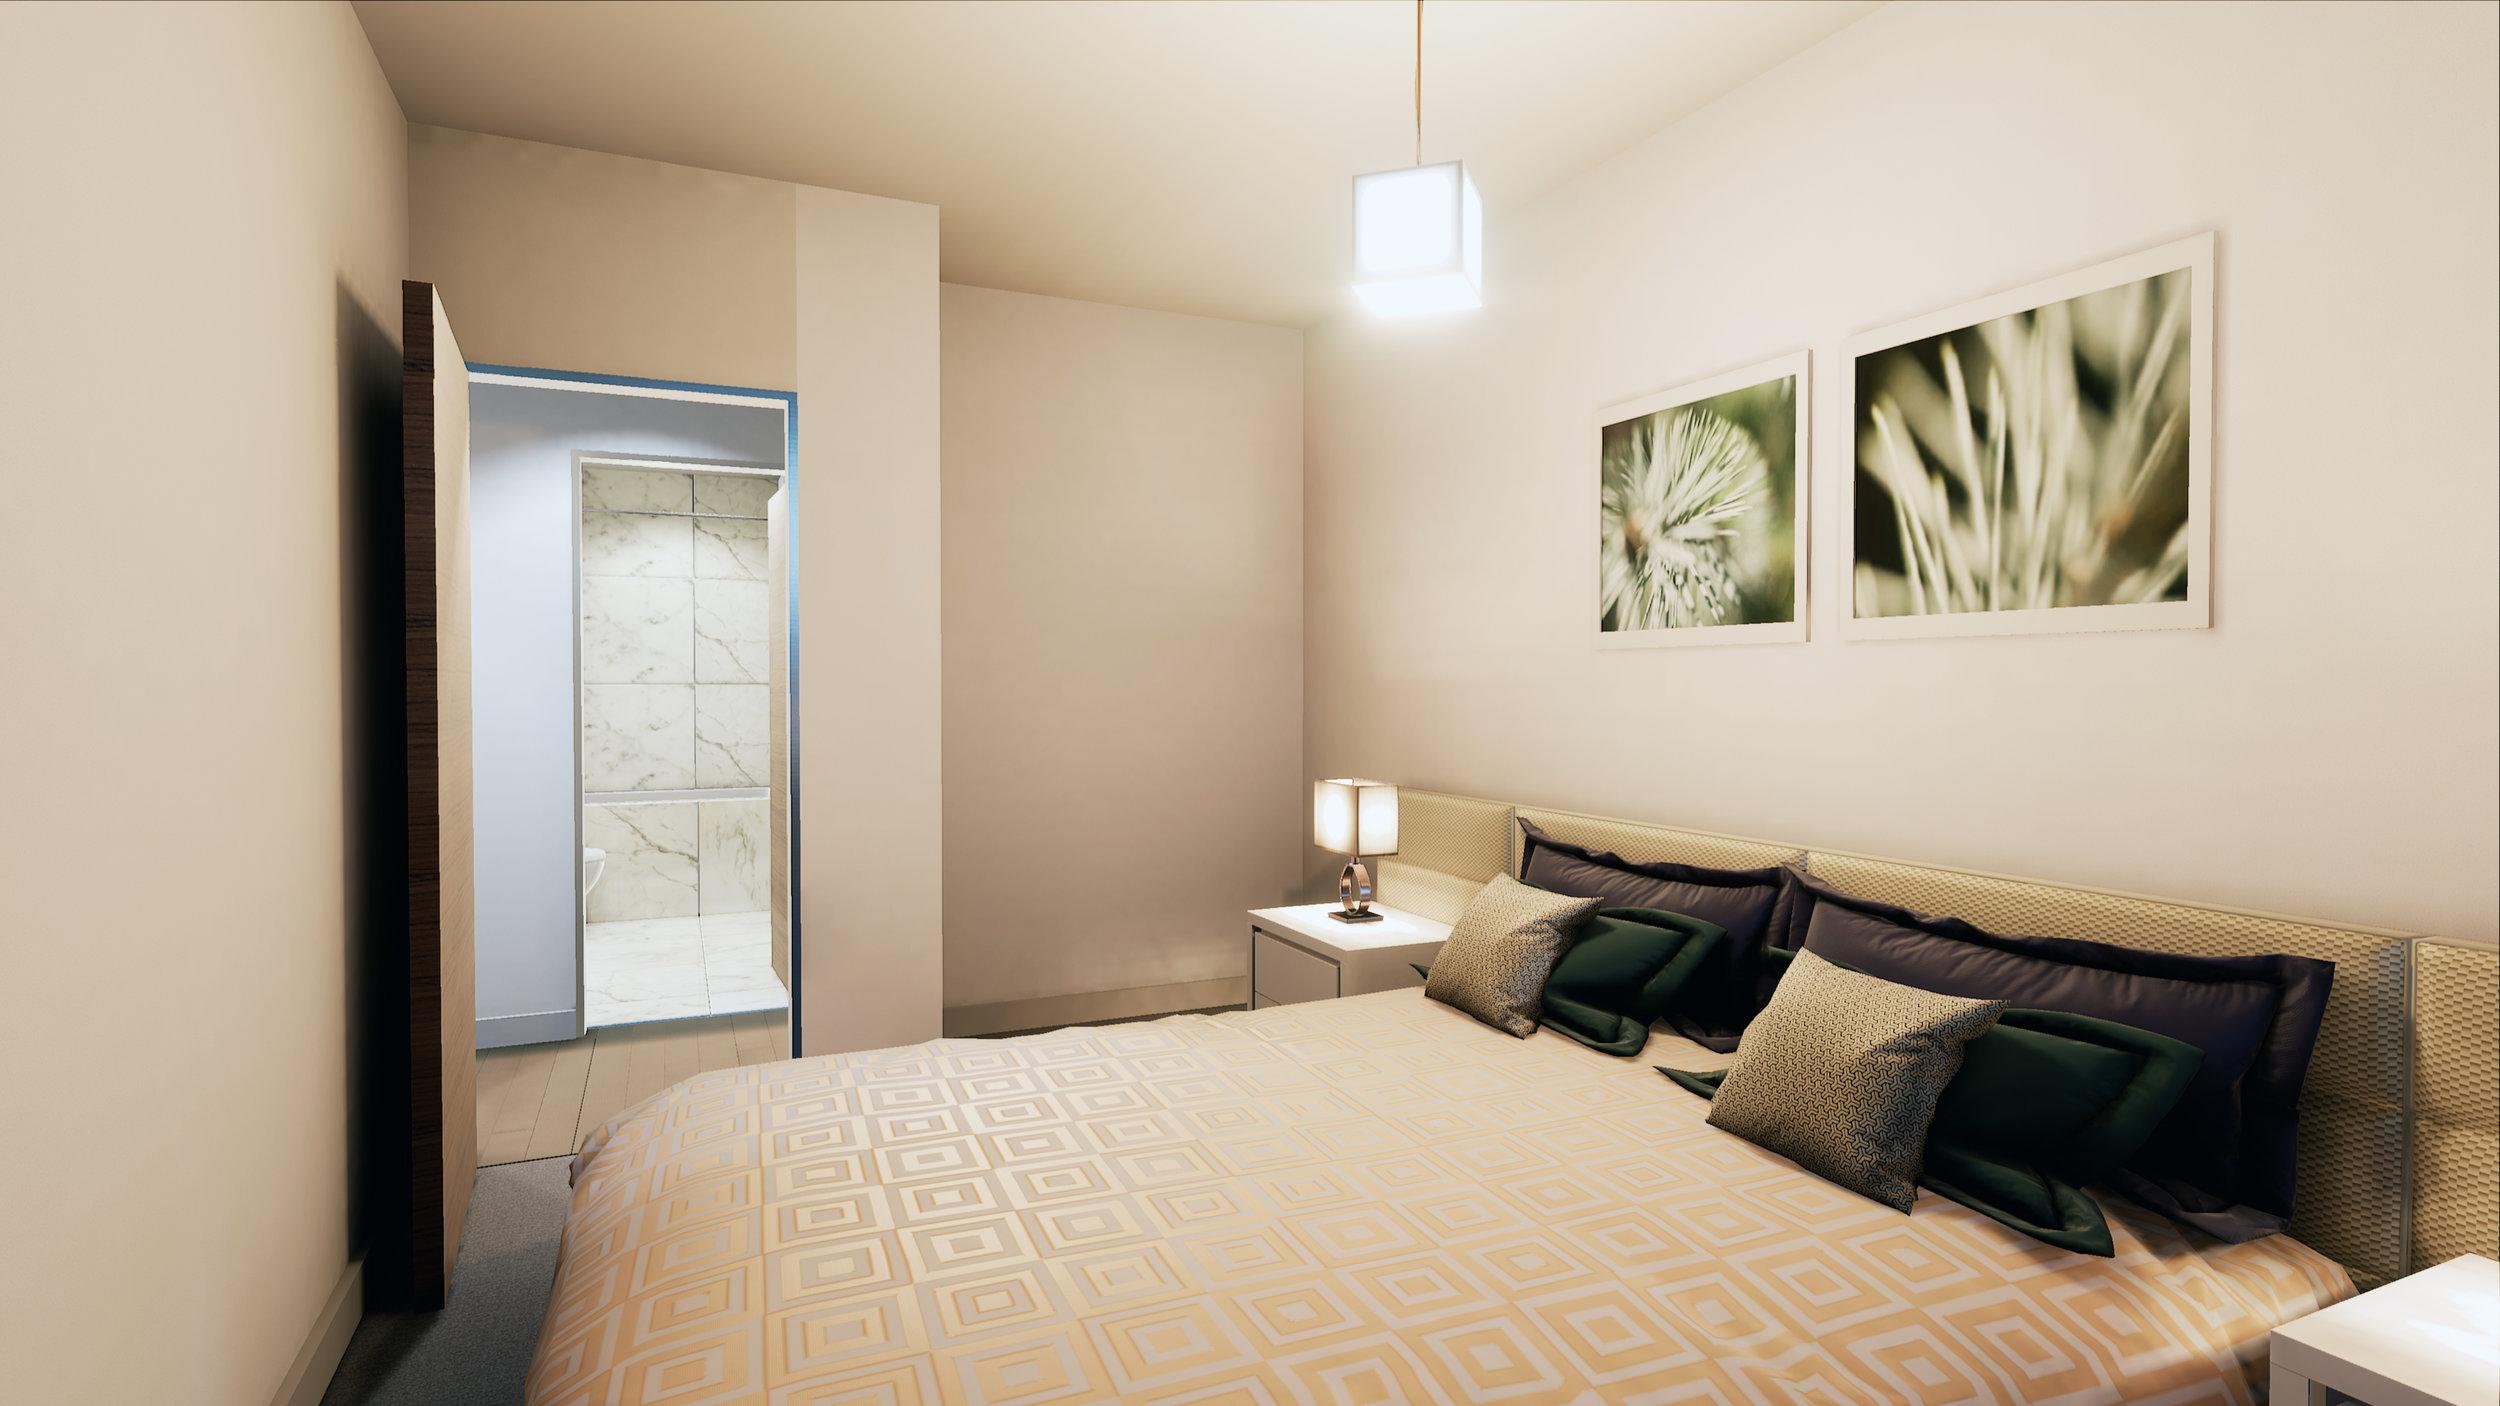 Apartment01_0006.jpg